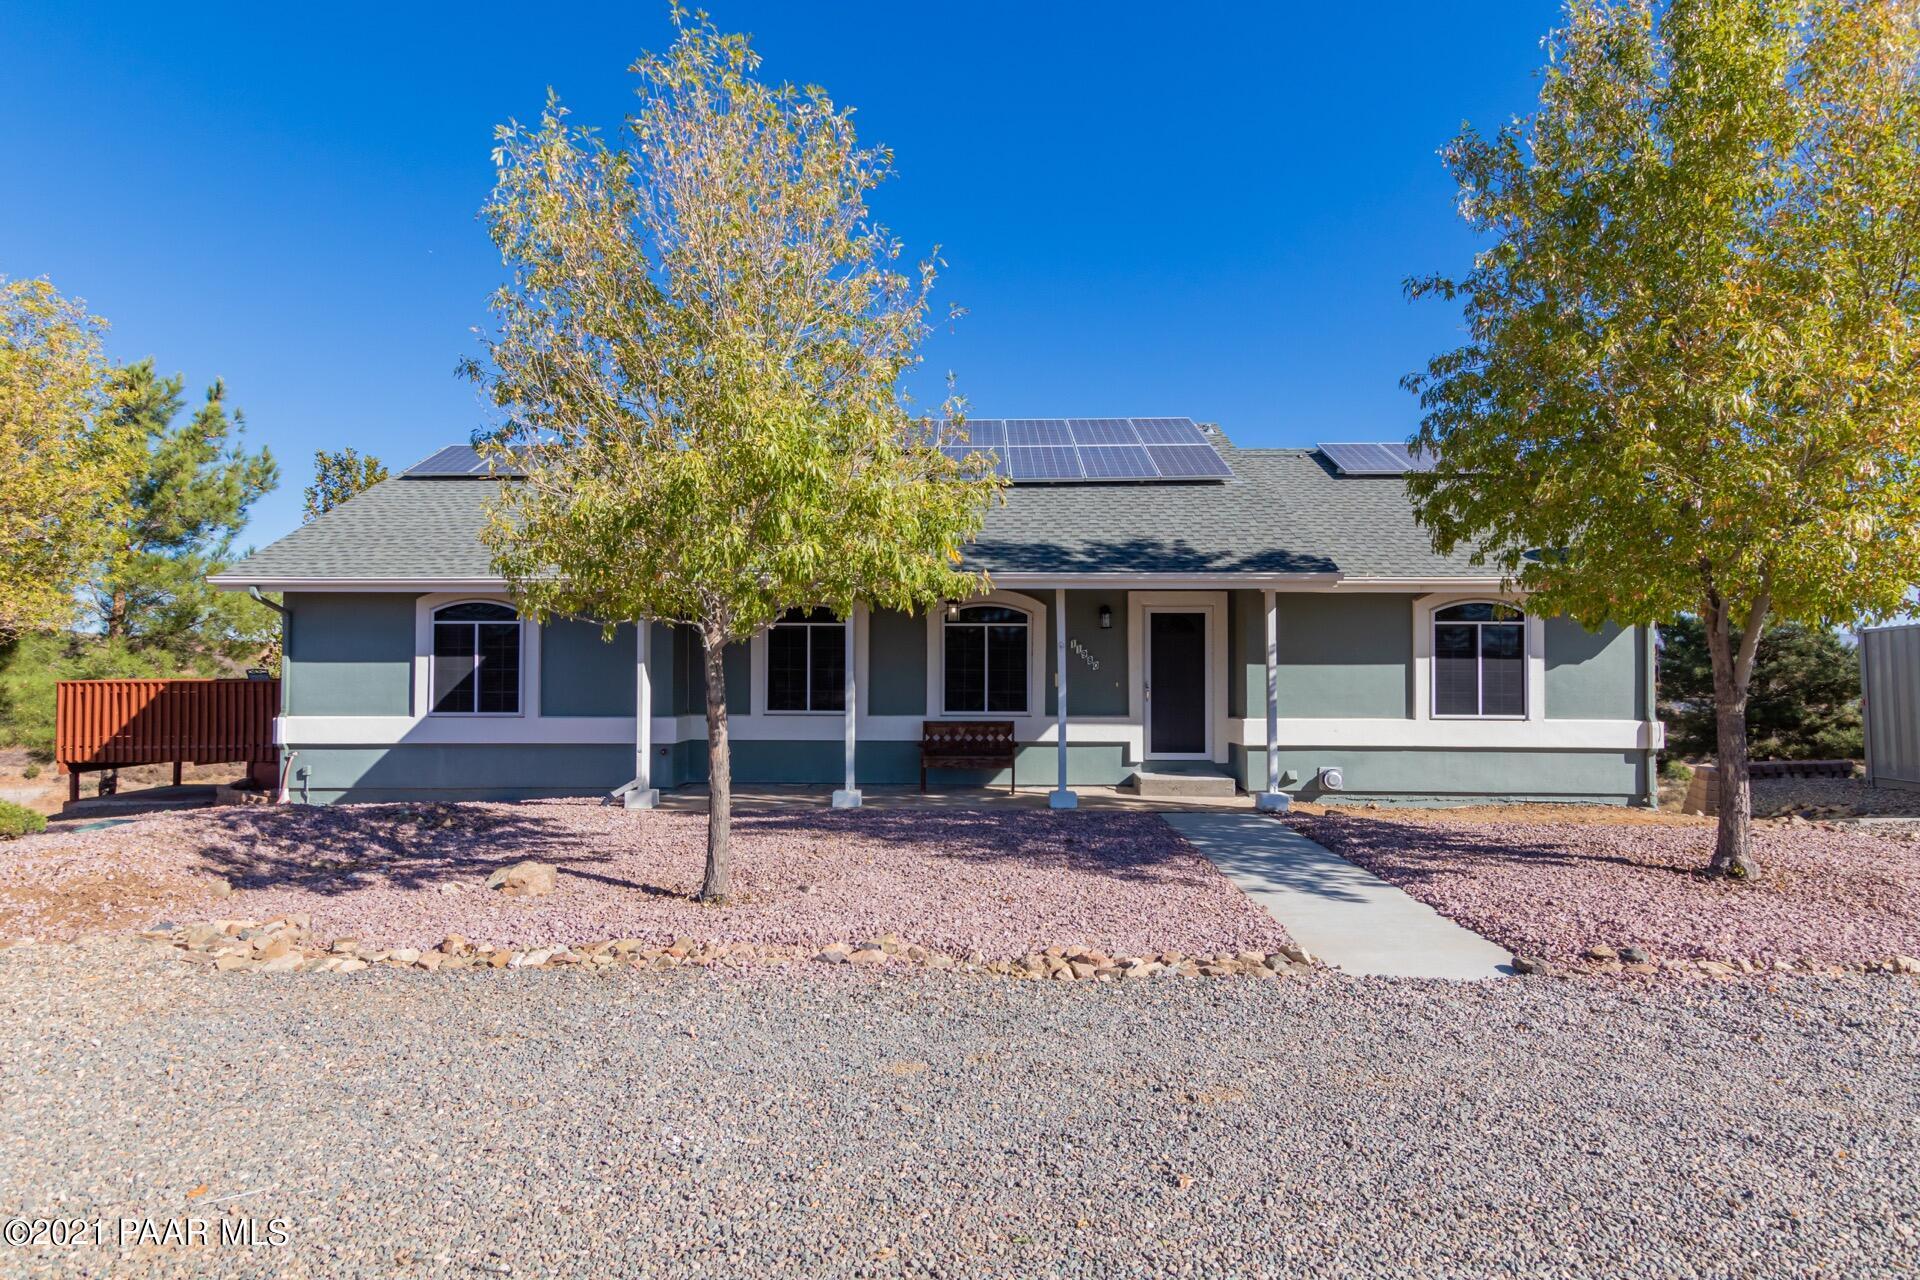 Photo of 11980 Cody Ridge, Dewey-Humboldt, AZ 86327